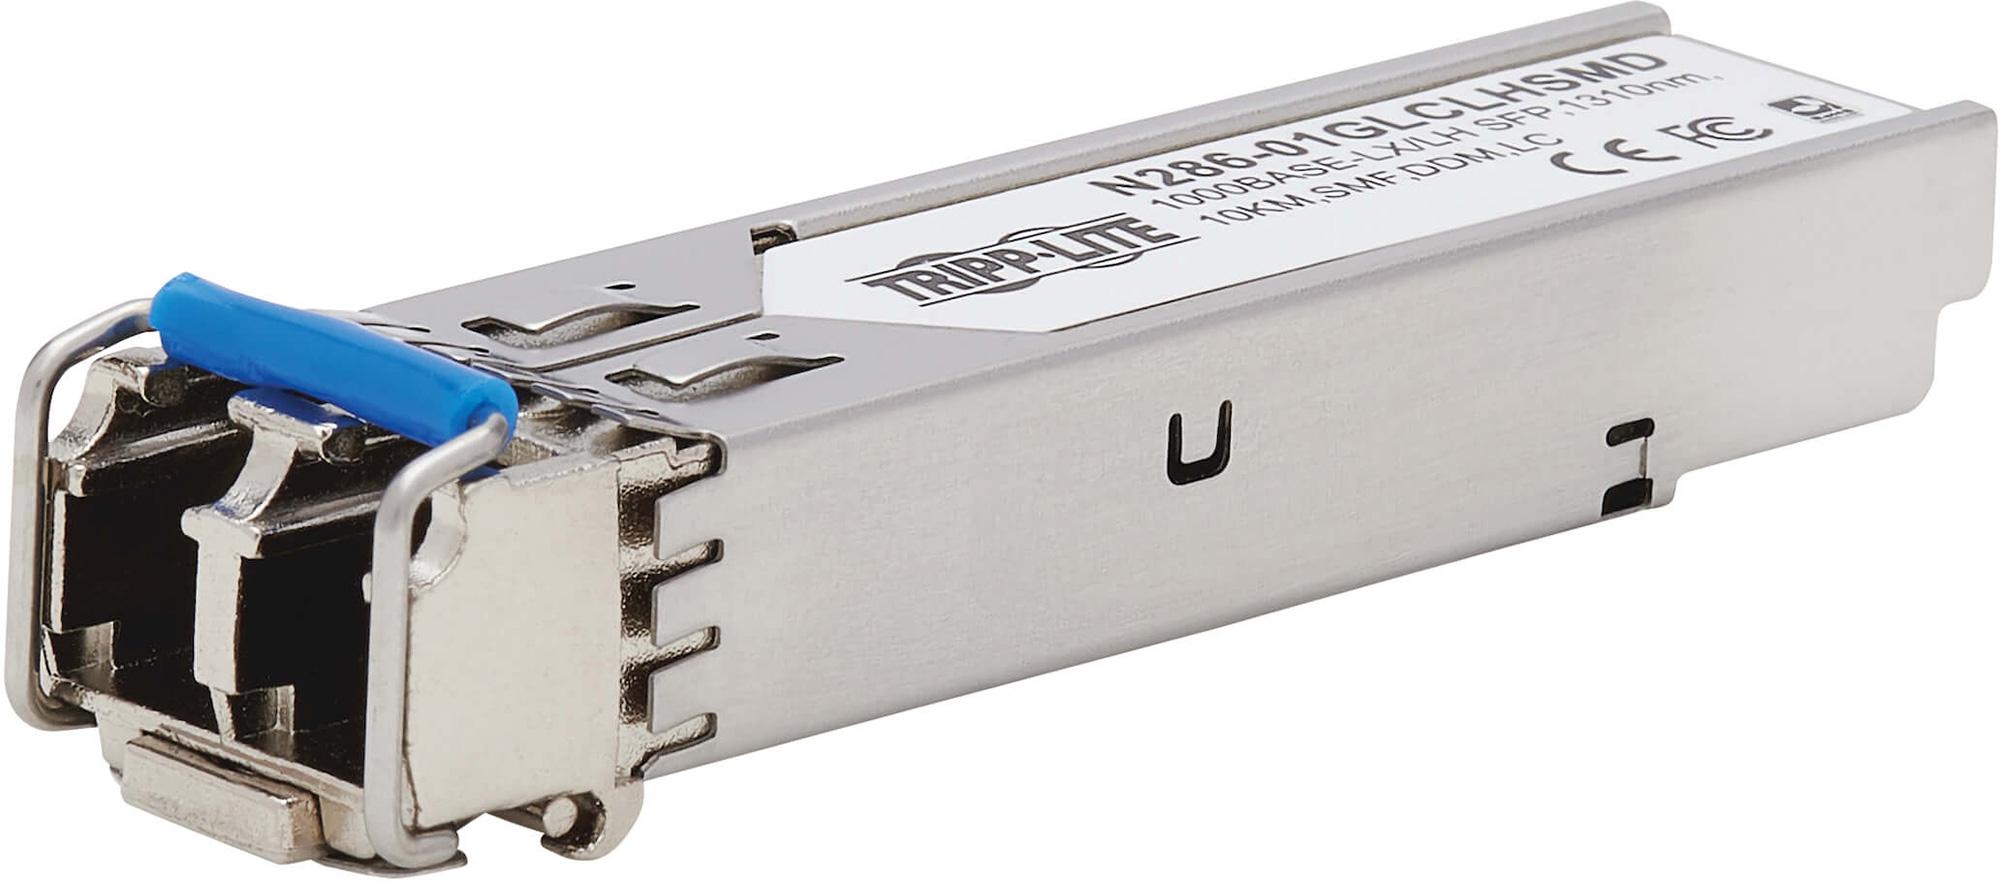 Tripp Lite N286-01GLCLHSMD Cisco GLC-LH-SMD Compatible SFP Singlemode Transceiver 10/100/1000 LX/LH LC - 1310 nm - 10 km  N286-01GLCLHSMD